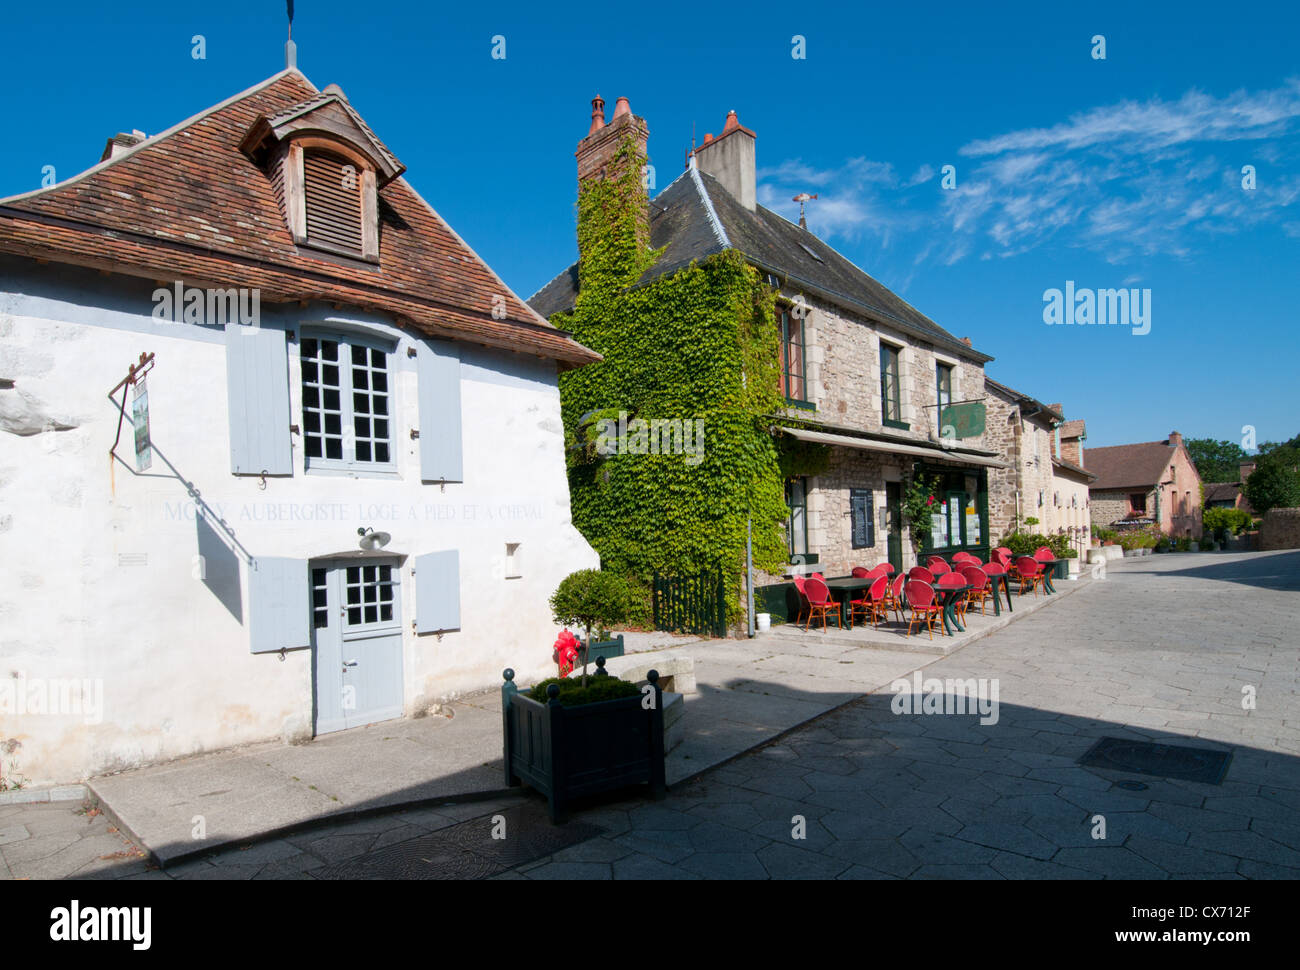 Saint-Céneri-le-Gérei, one of the prettiest villages in France, Orne, Basse-Normandie, France. Europe. - Stock Image